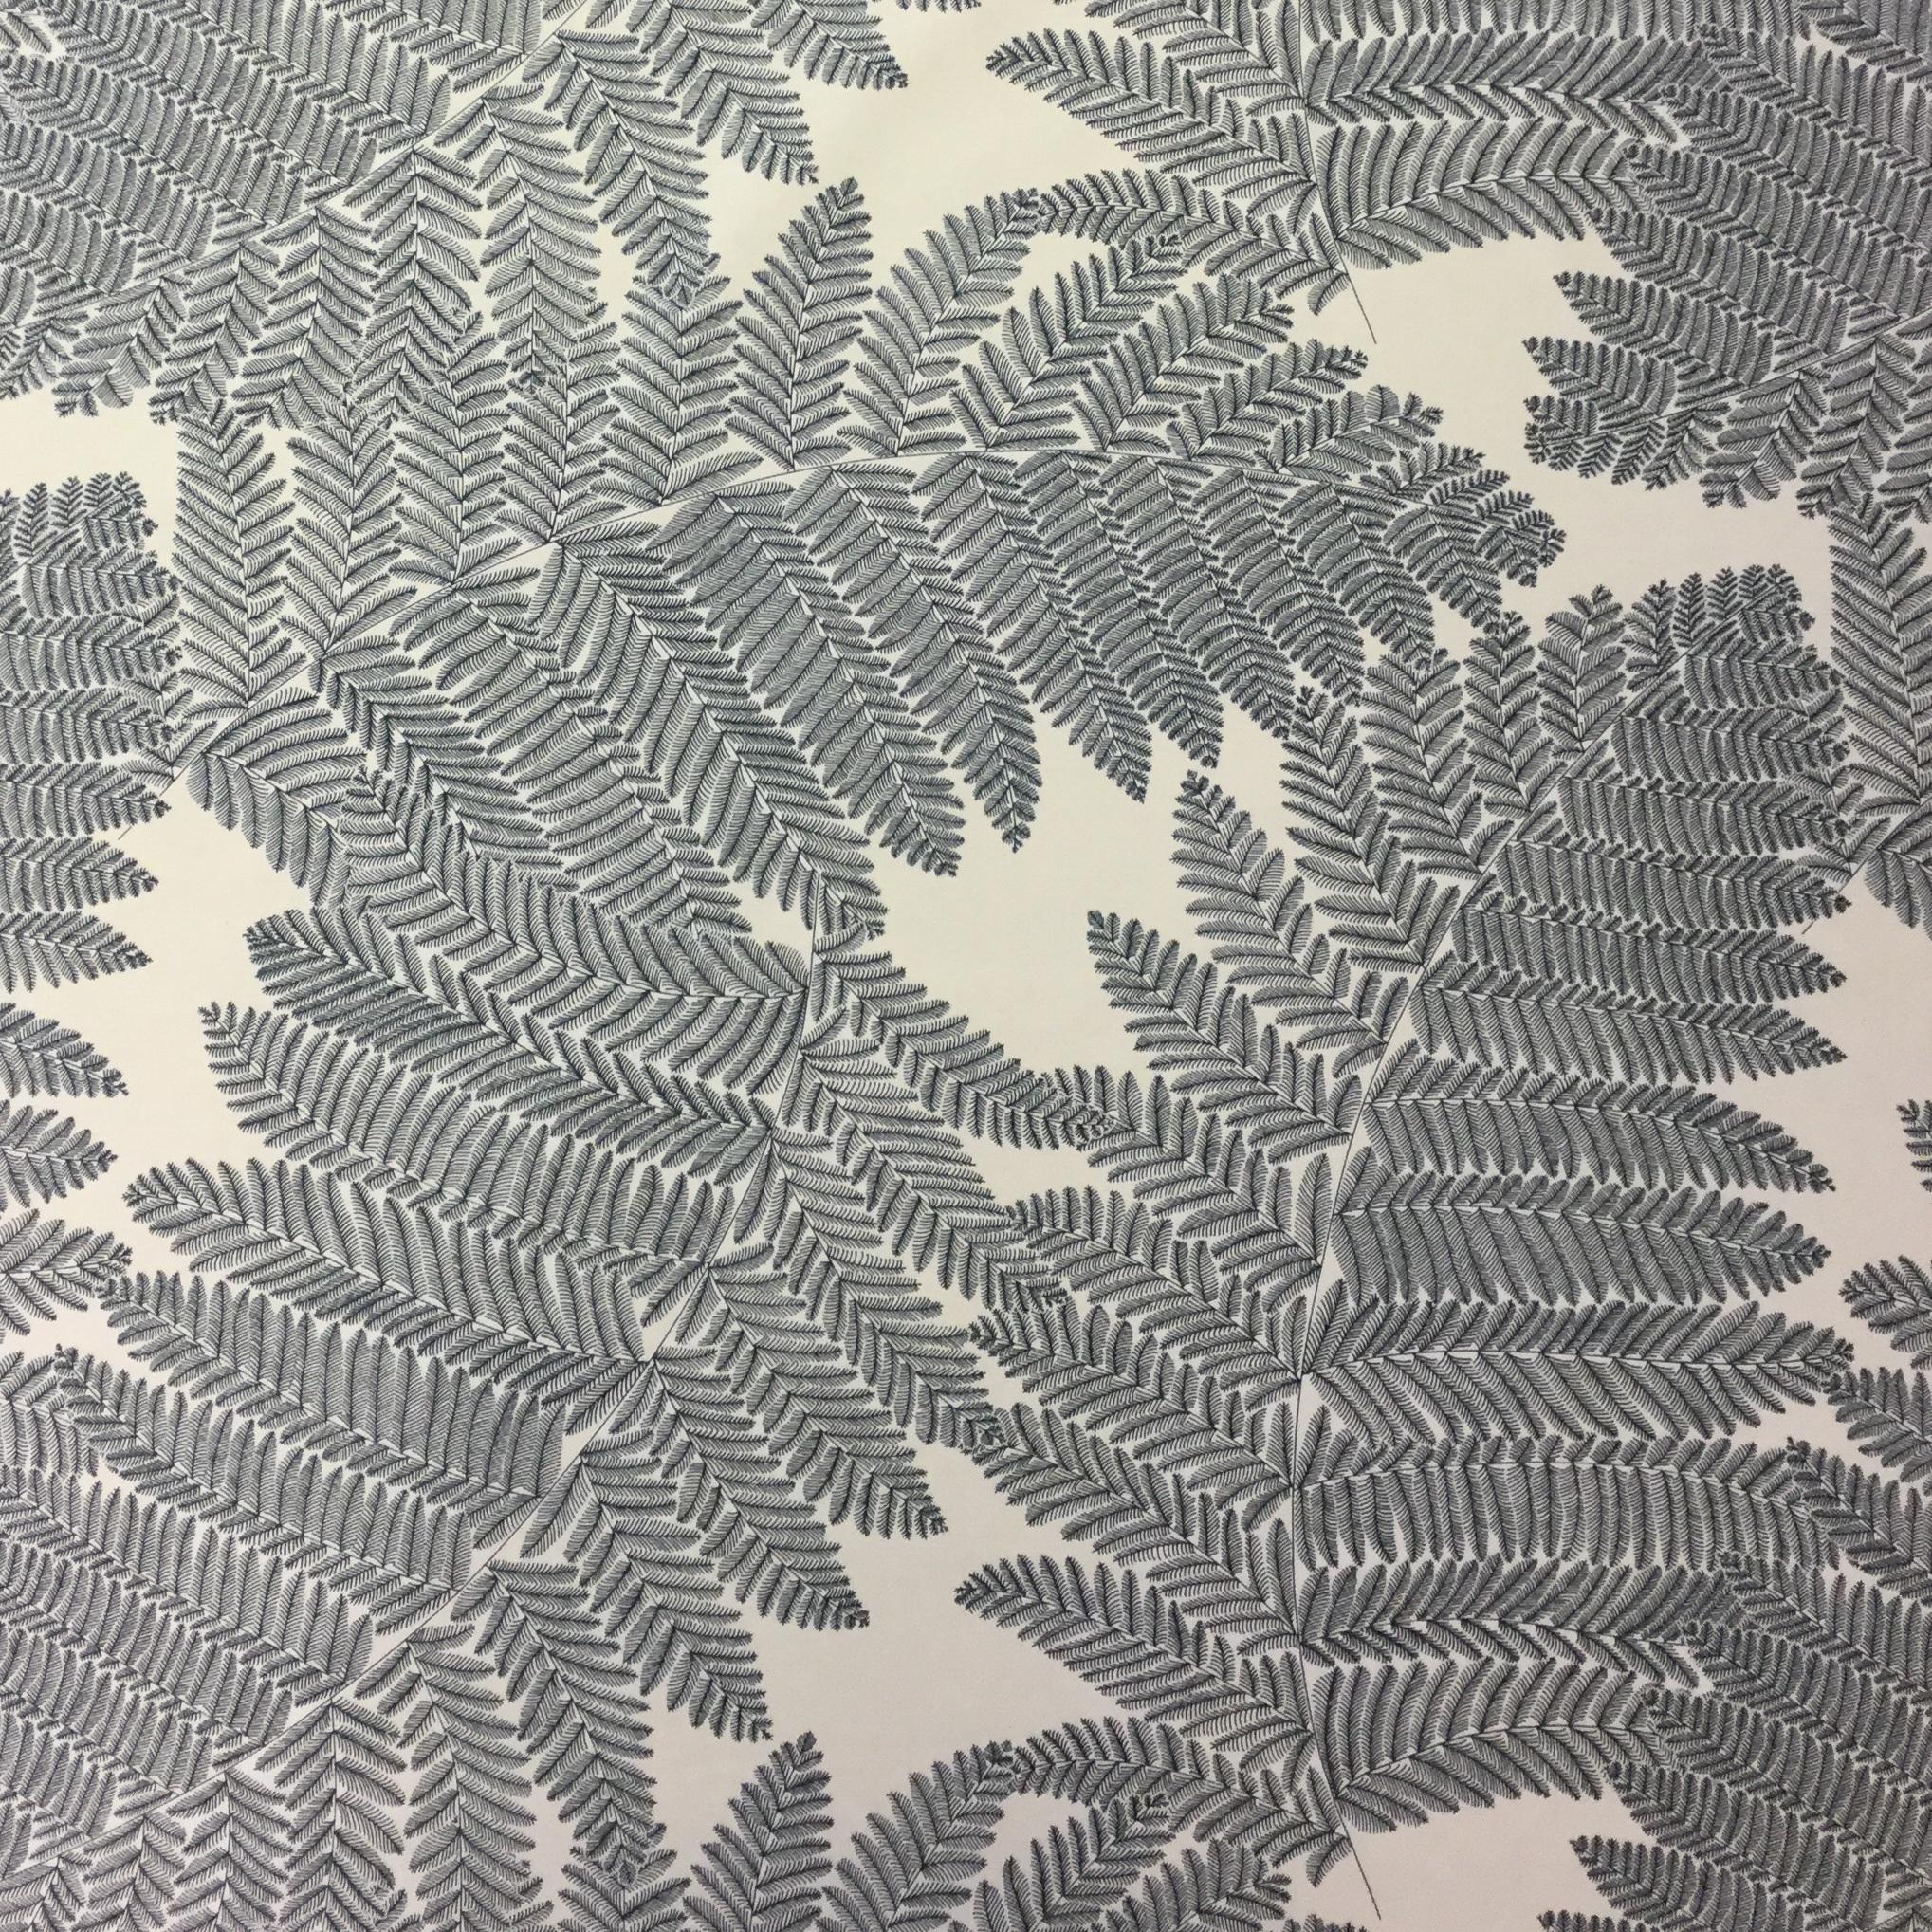 Ormbunke blad blå vit hemtextil tyg Tyglust